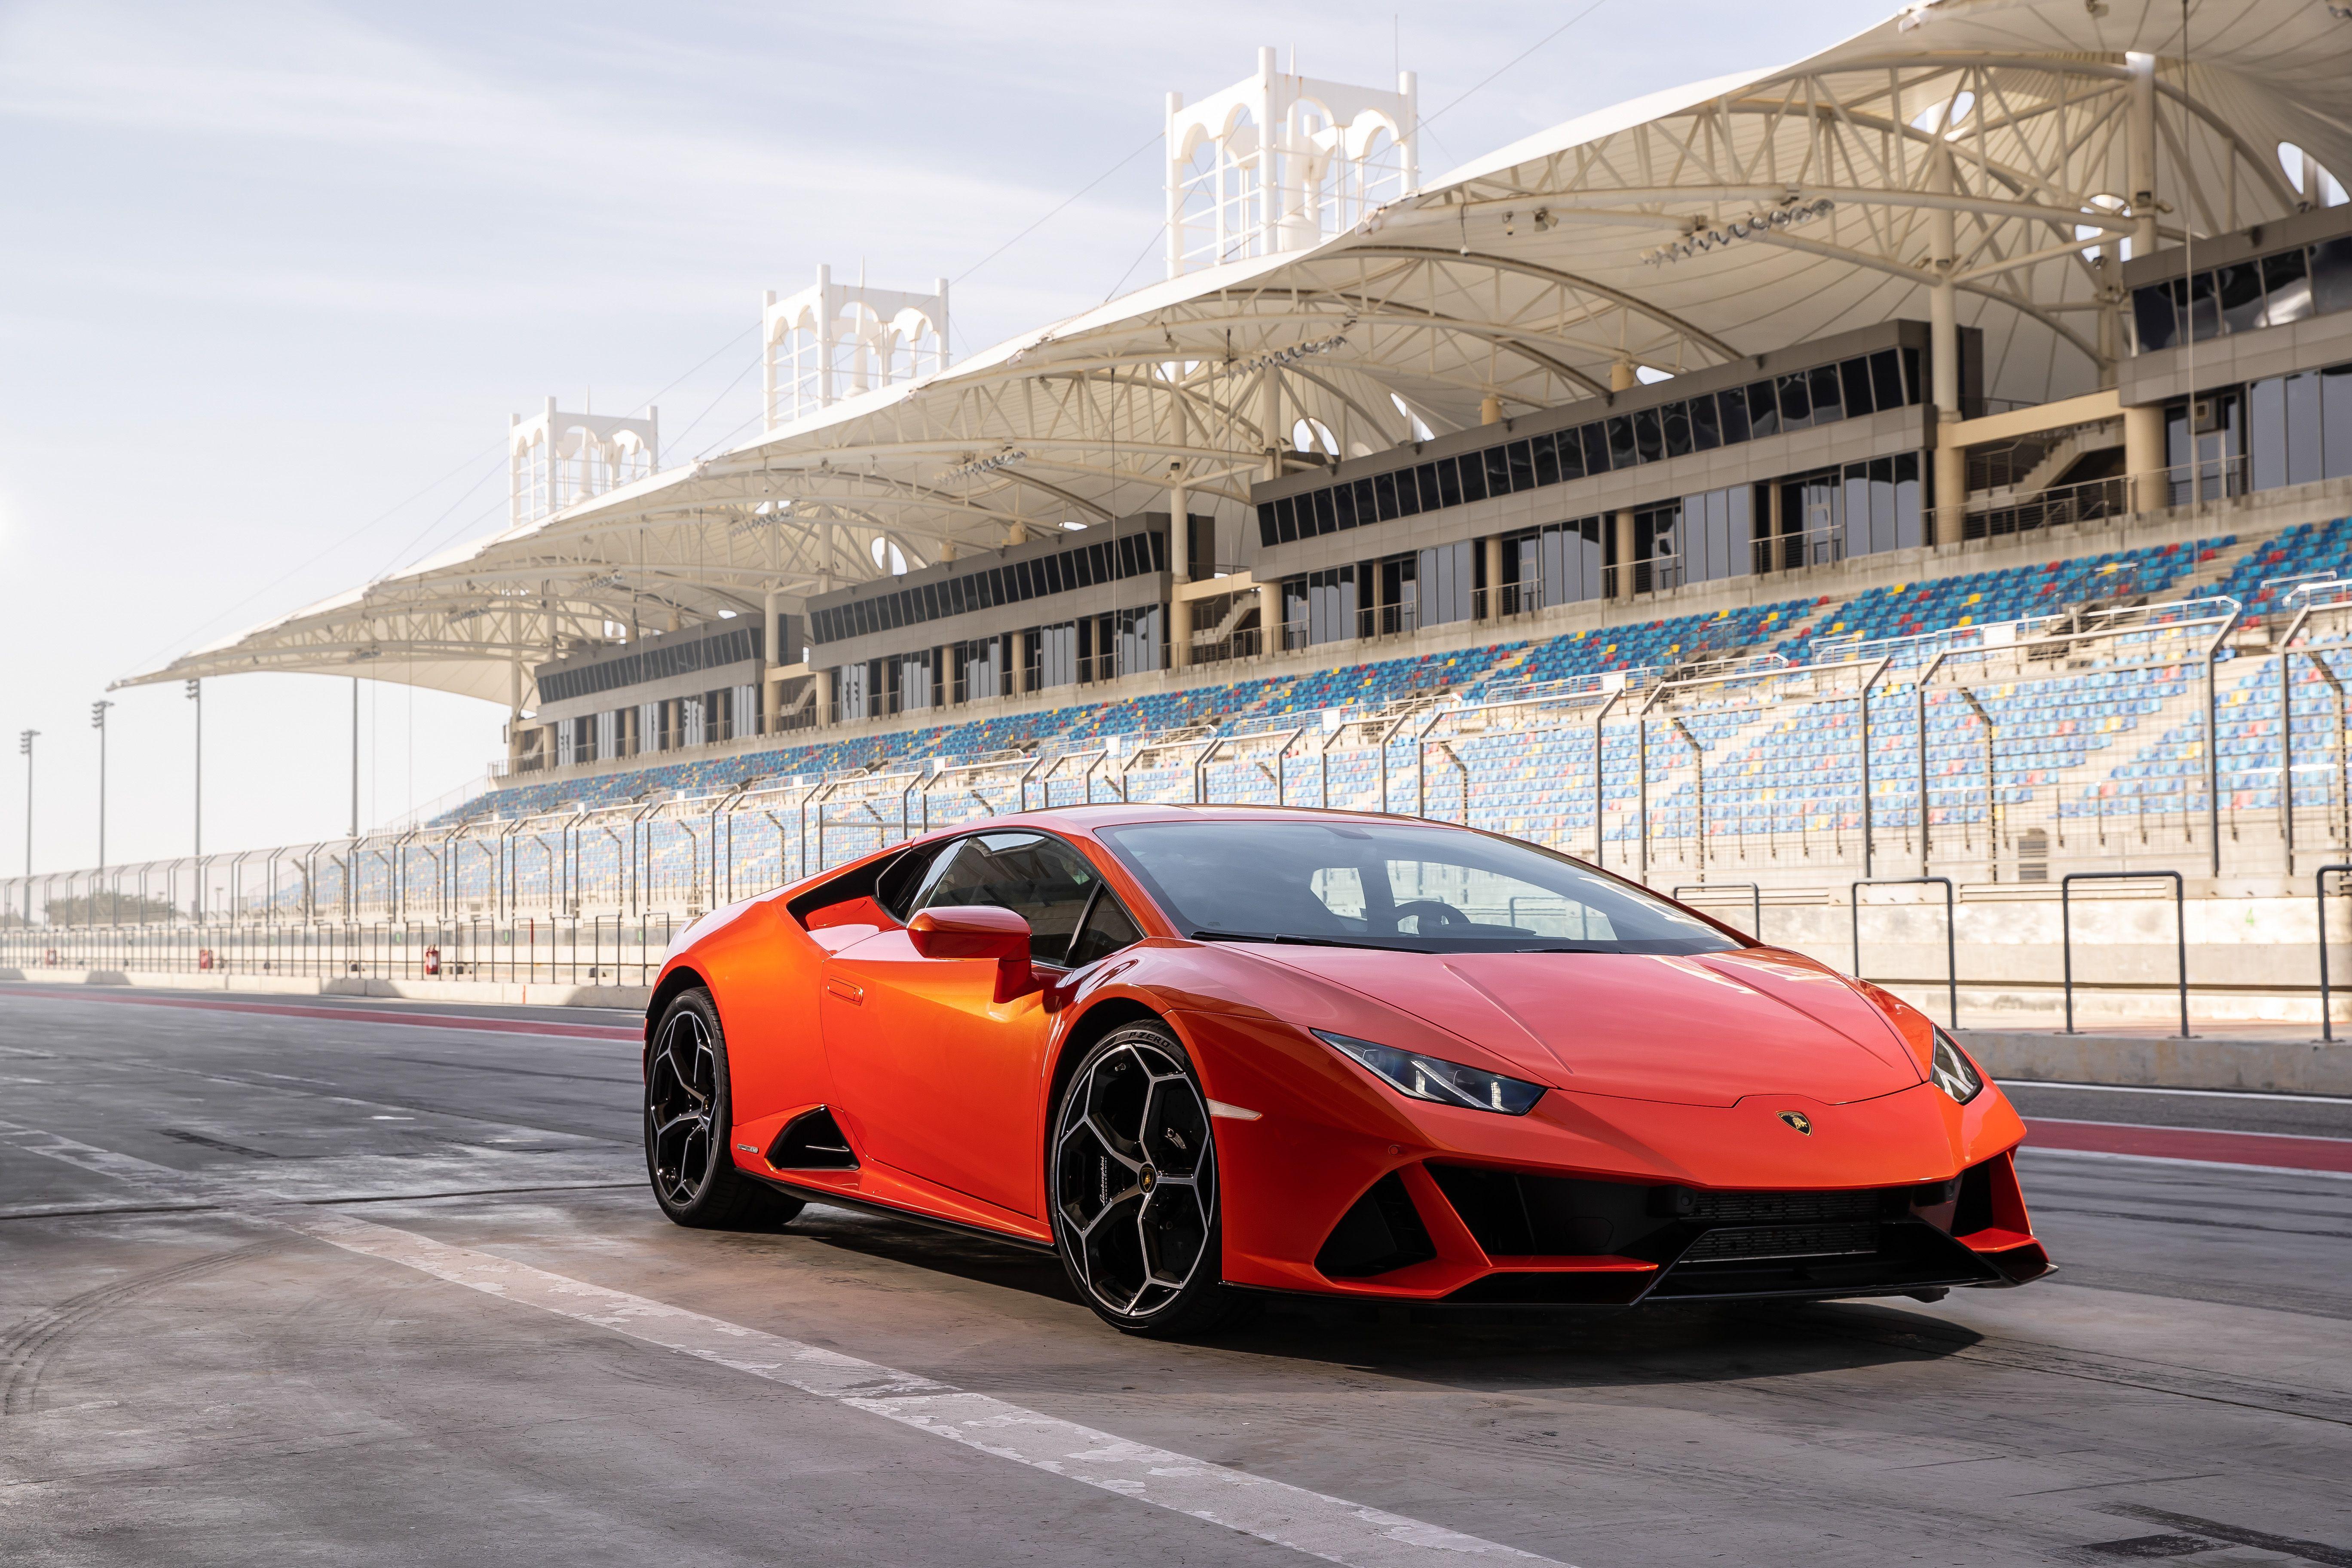 2019 Lamborghini Huracán Review, Pricing, and Specs